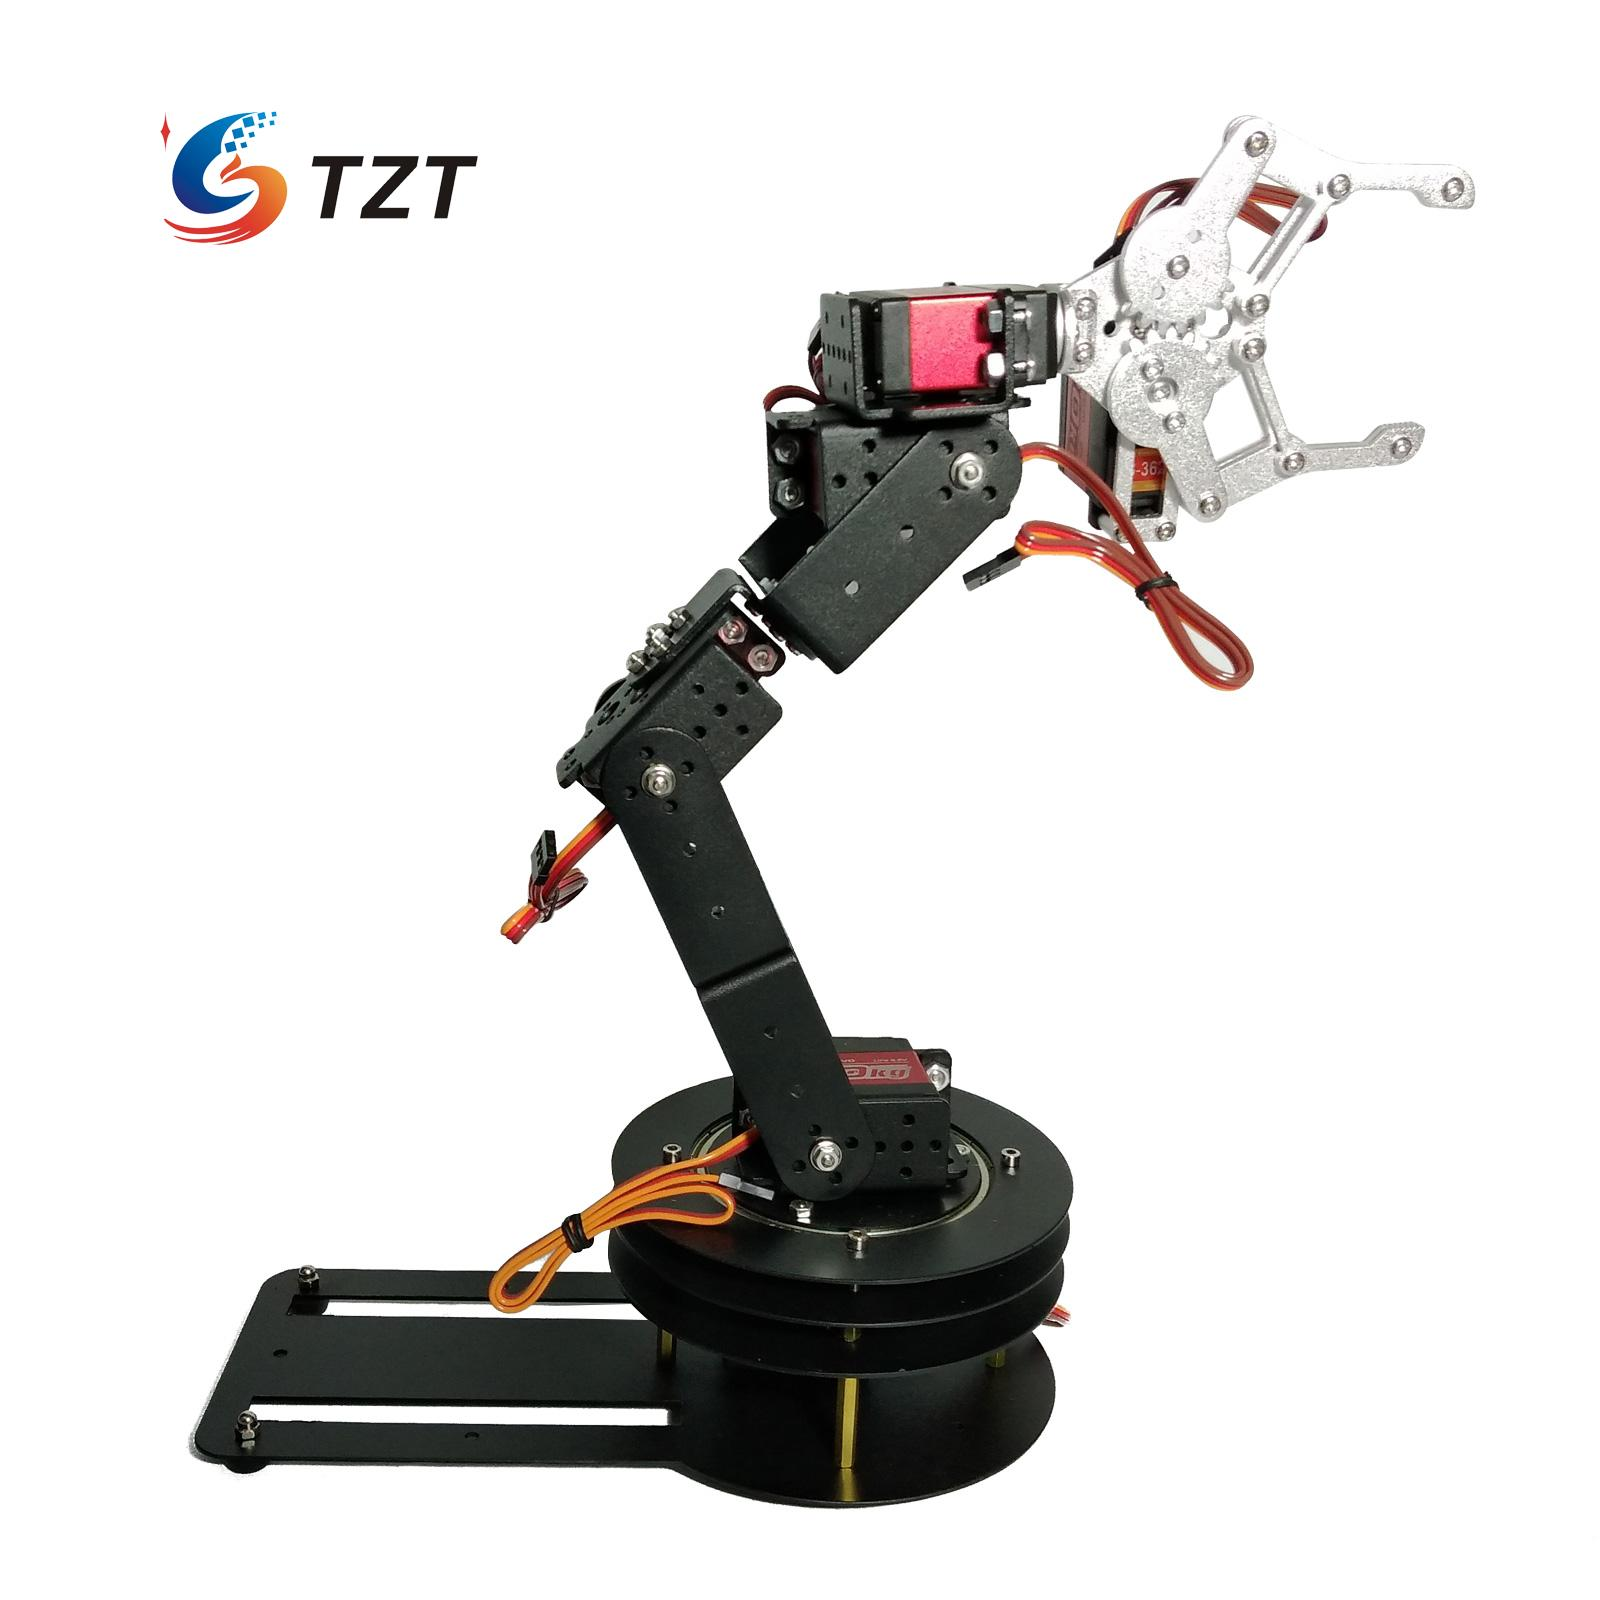 6-Axis 6DOF Robot Mechanical Arm Manipulator Single Frame with 6PCS MG996R Servo 6PCS Servo Horn 6 dof robot arm six axis manipulators industrial robot model robot without controller mg996r